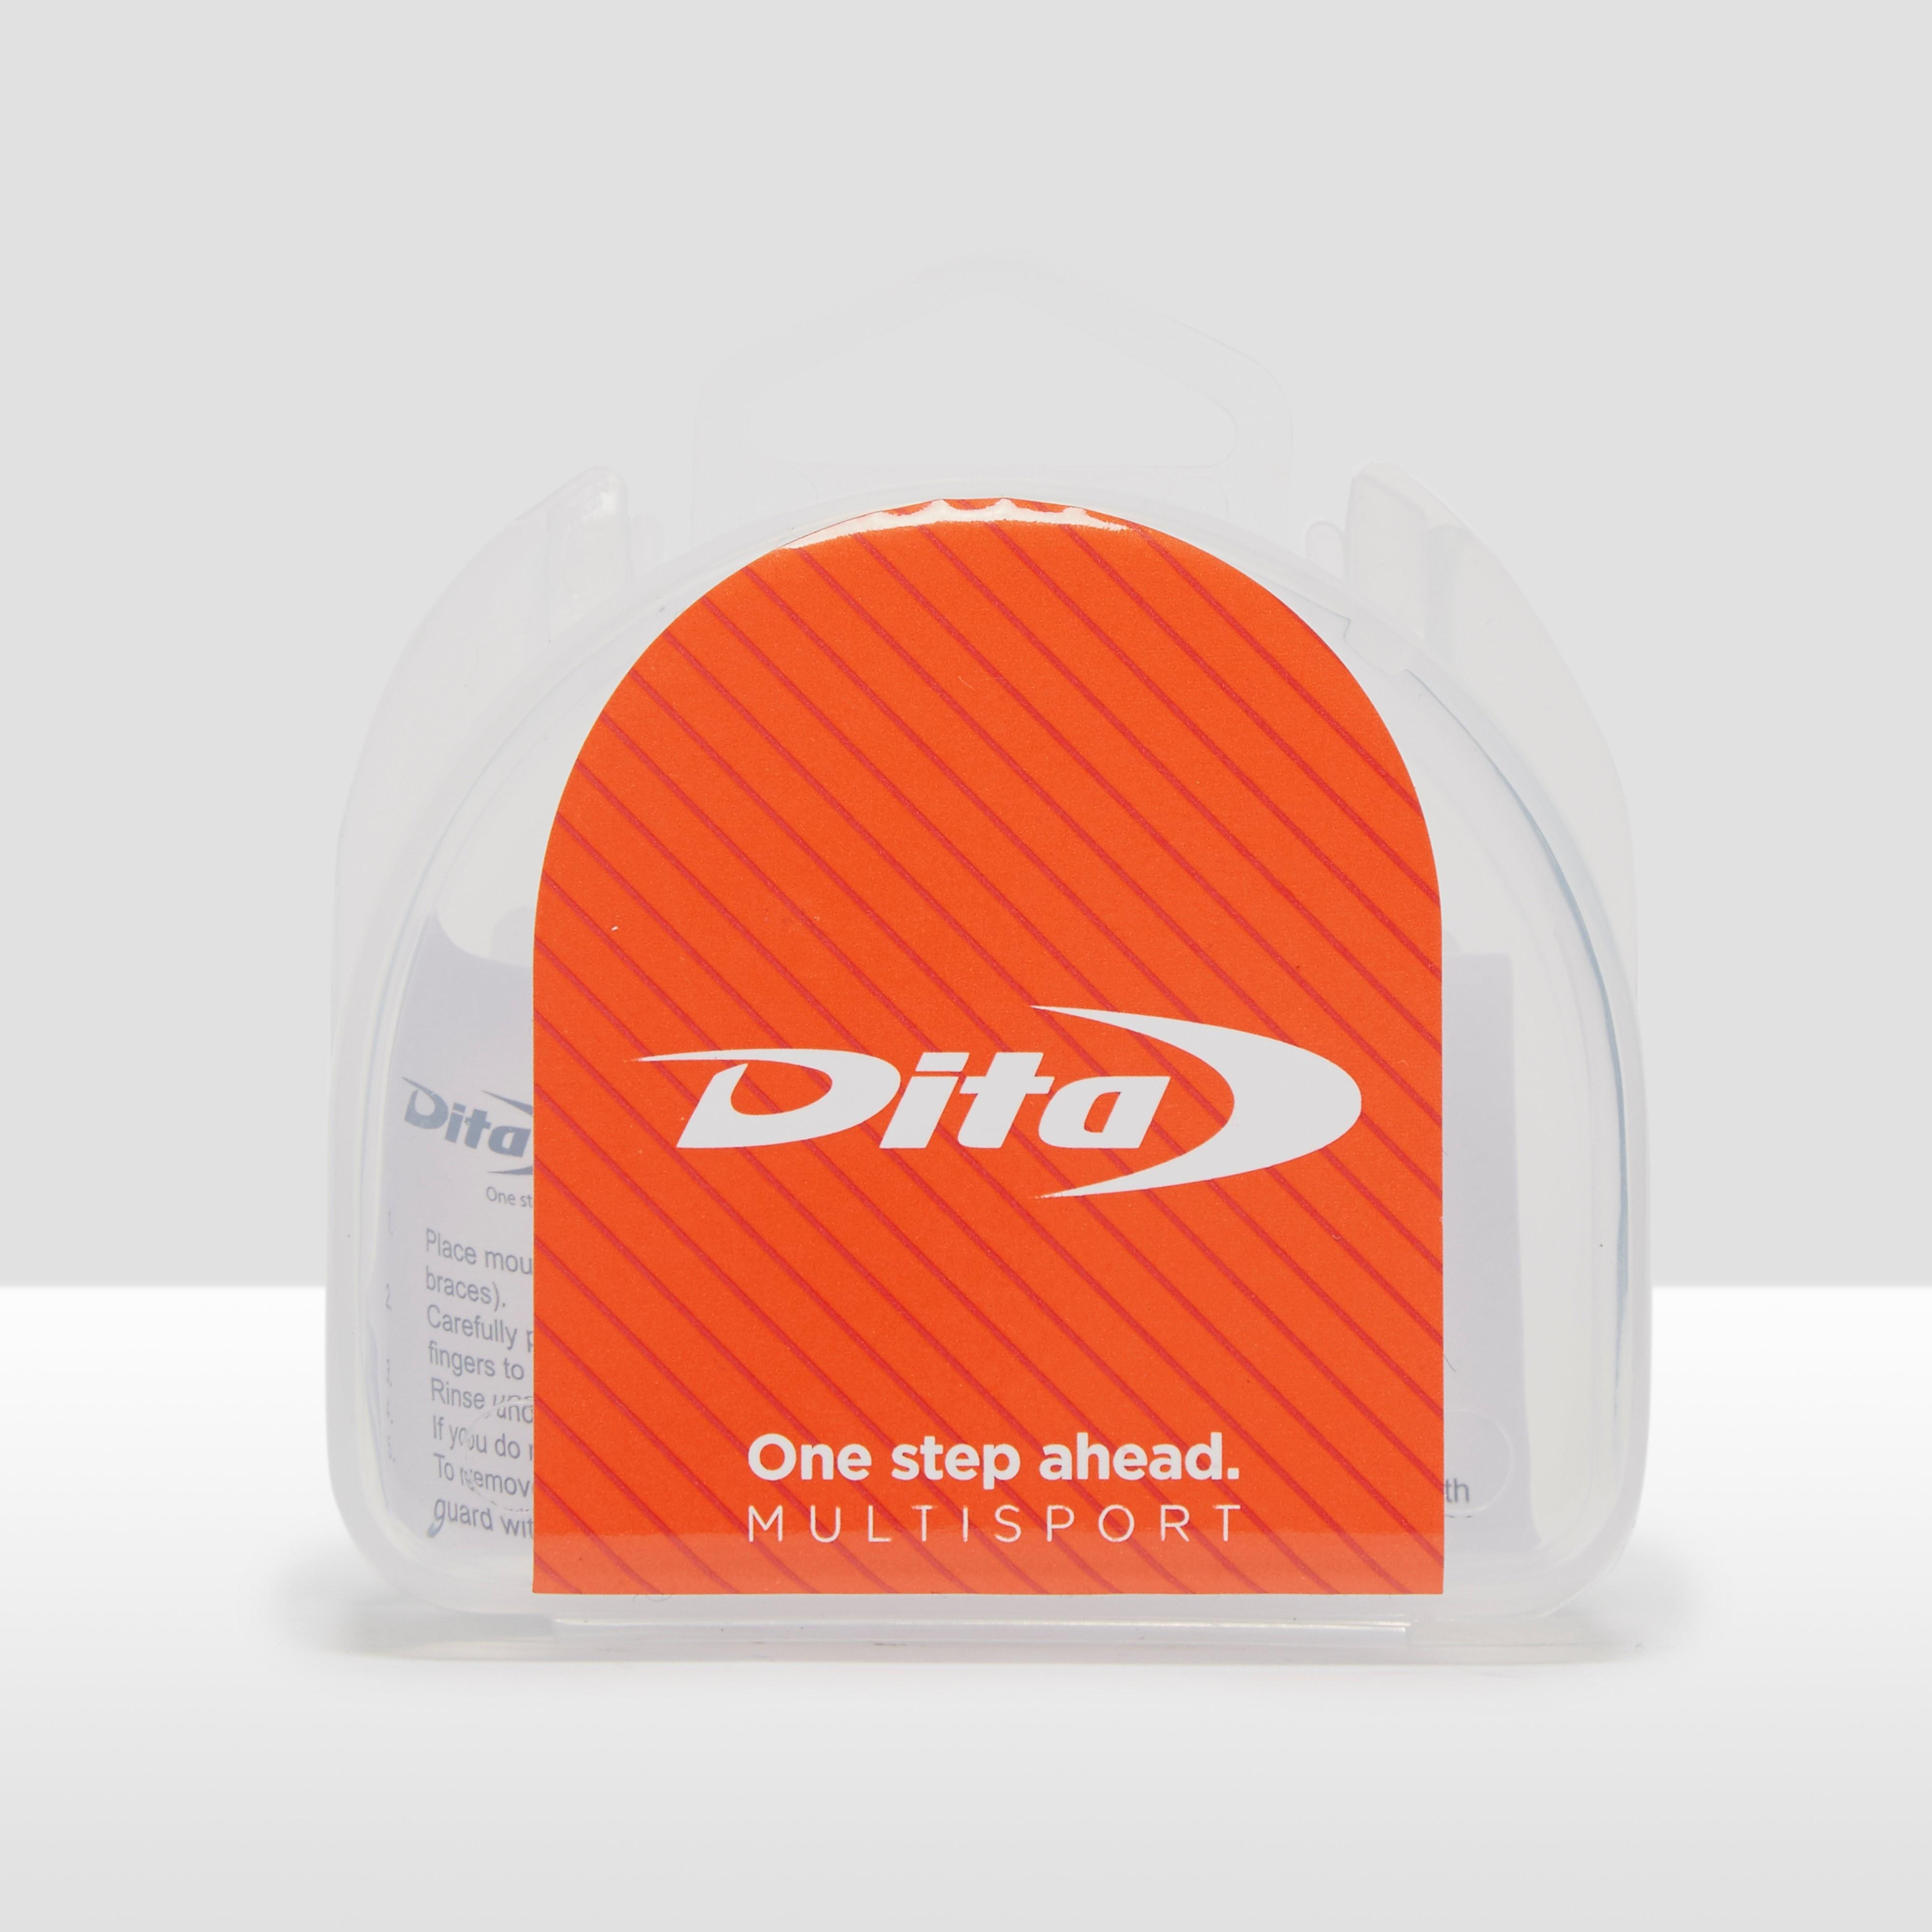 Dita Mouth Guard